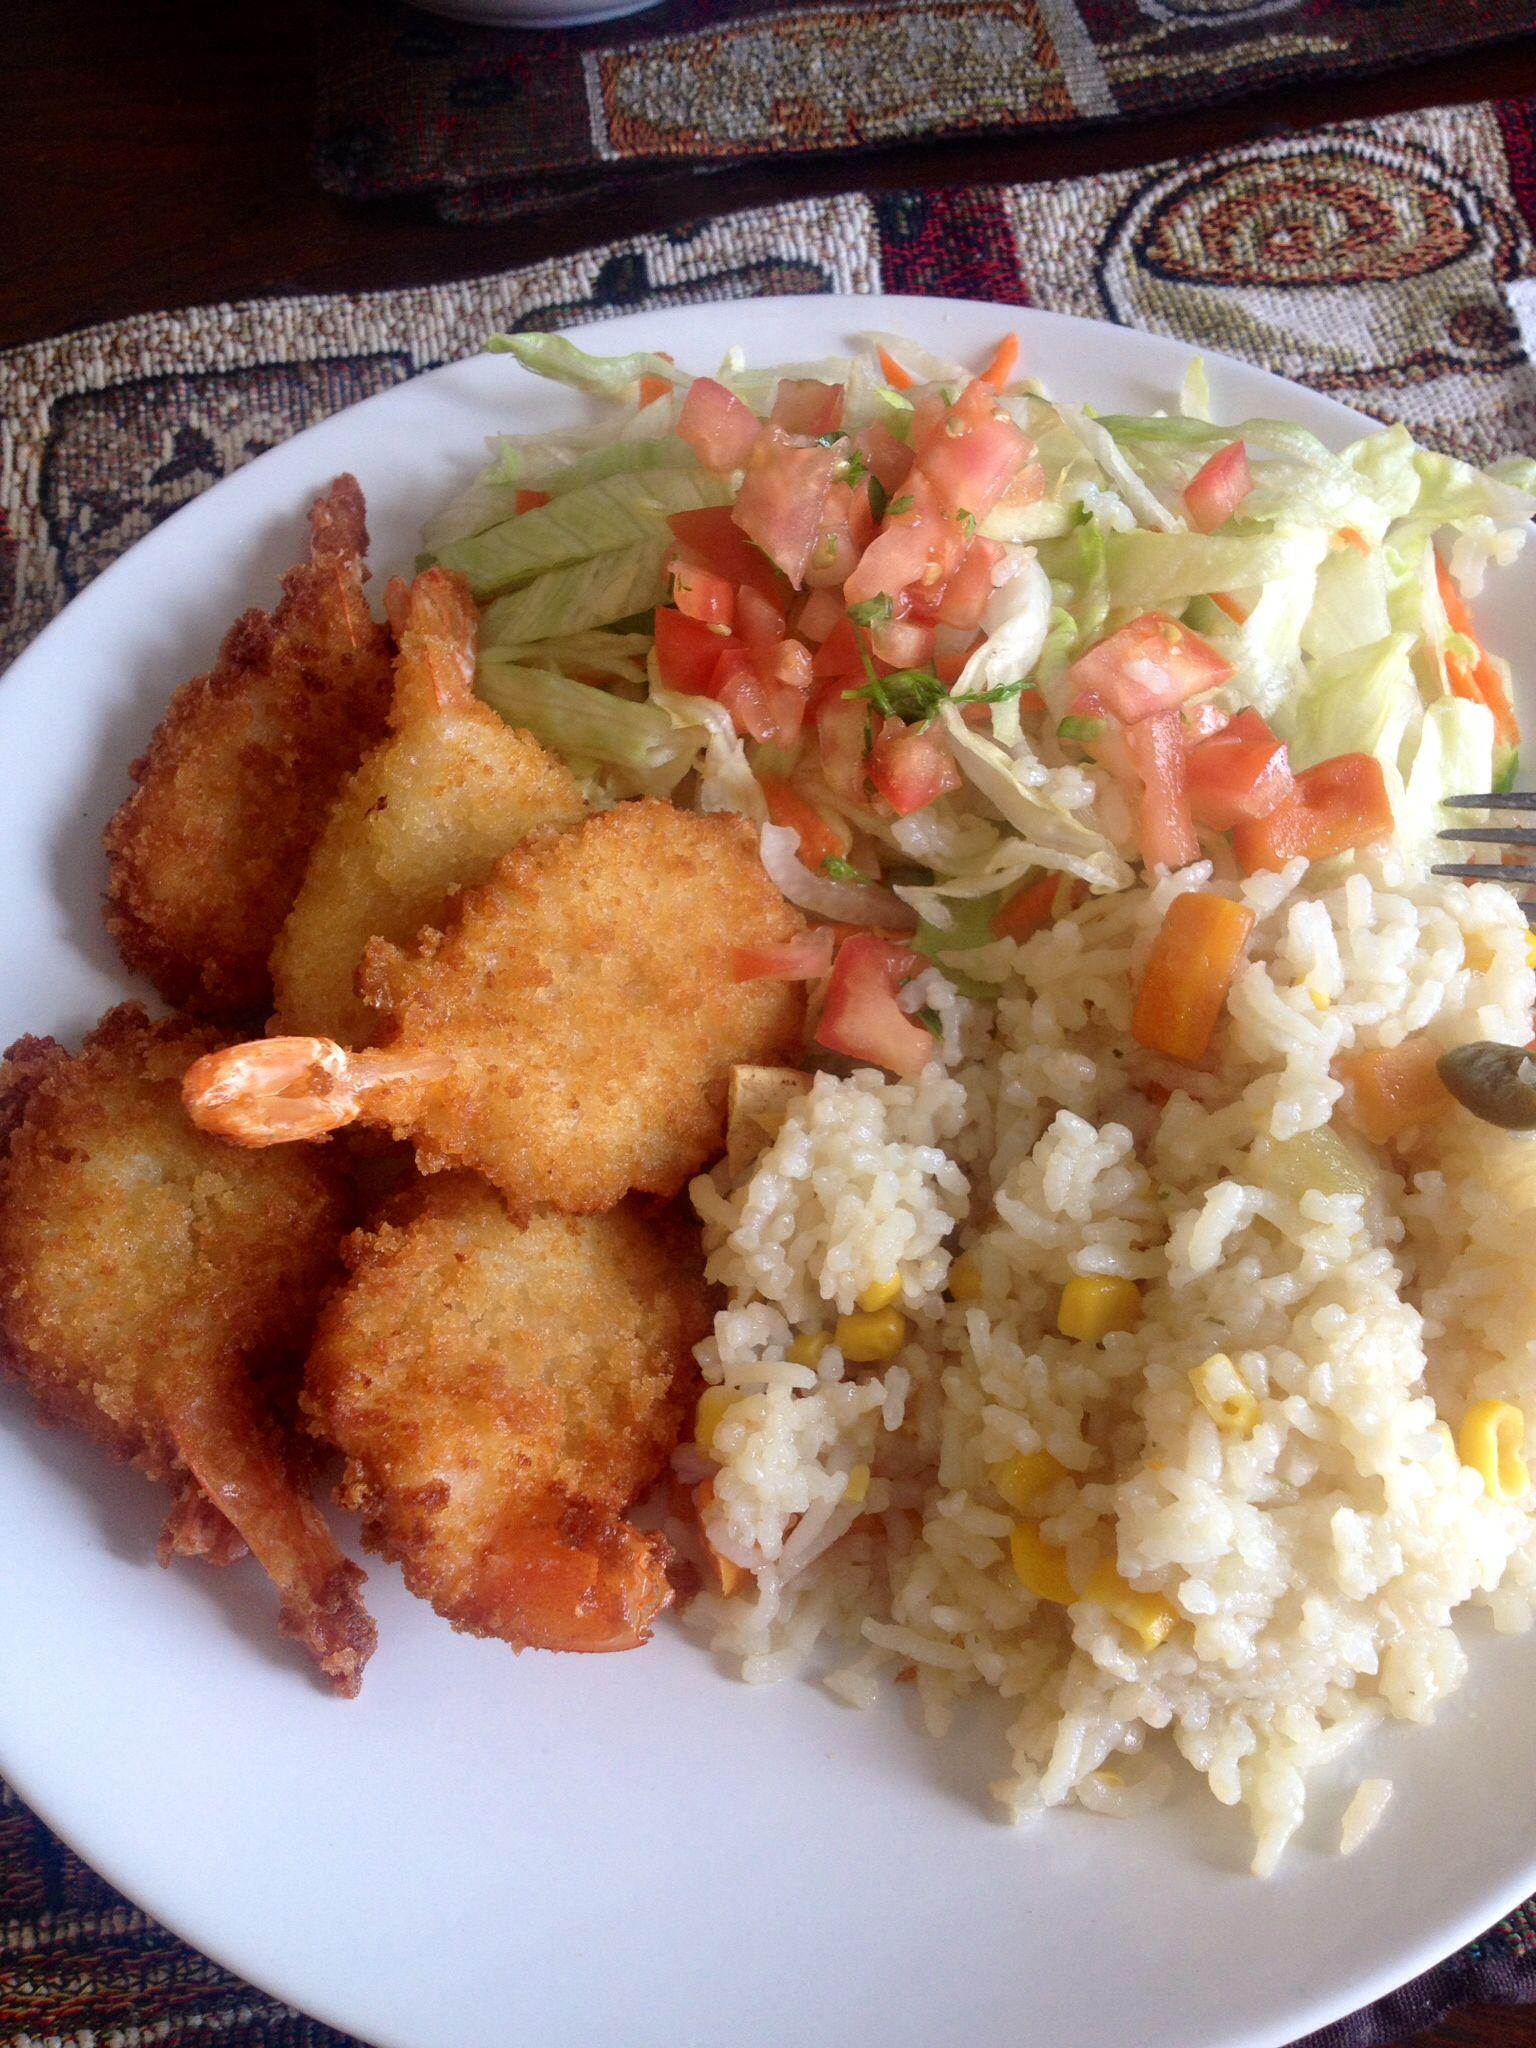 Shrimp, rice and salad